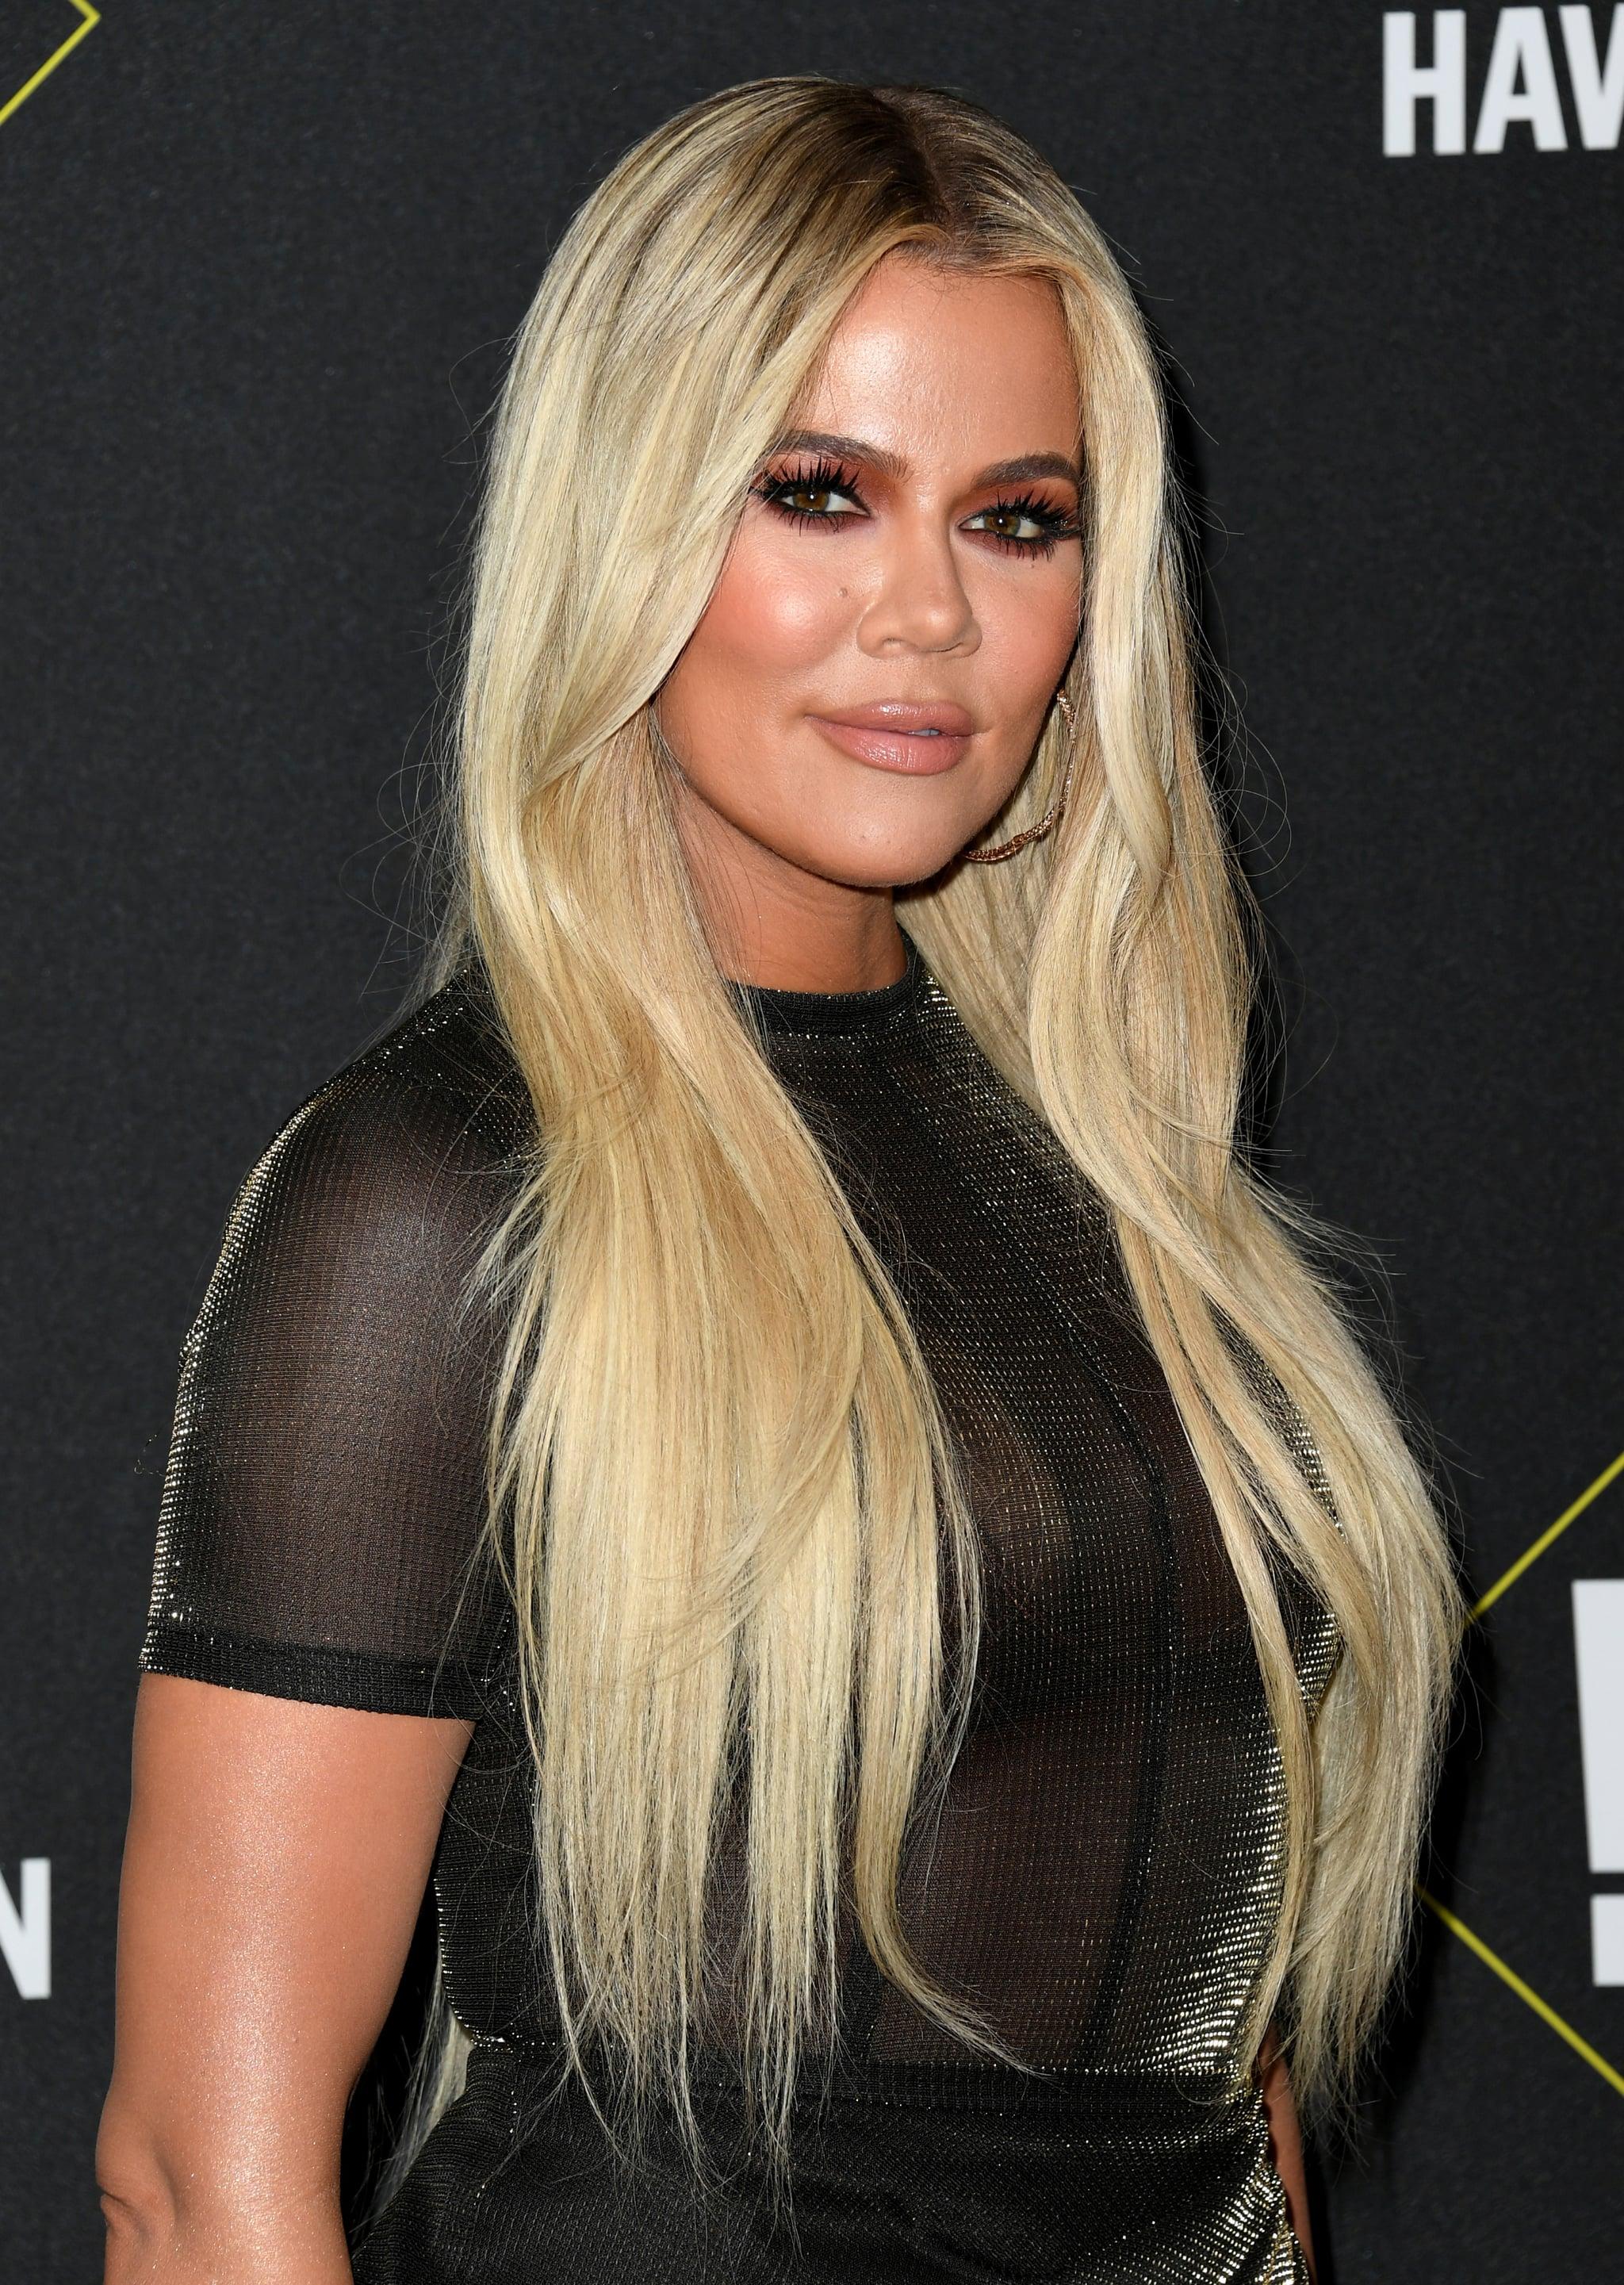 SANTA MONICA, CALIFORNIA - NOVEMBER 10: Khloé Kardashian attends the 2019 E! People's Choice Awards at Barker Hangar on November 10, 2019 in Santa Monica, California. (Photo by Jon Kopaloff/FilmMagic)